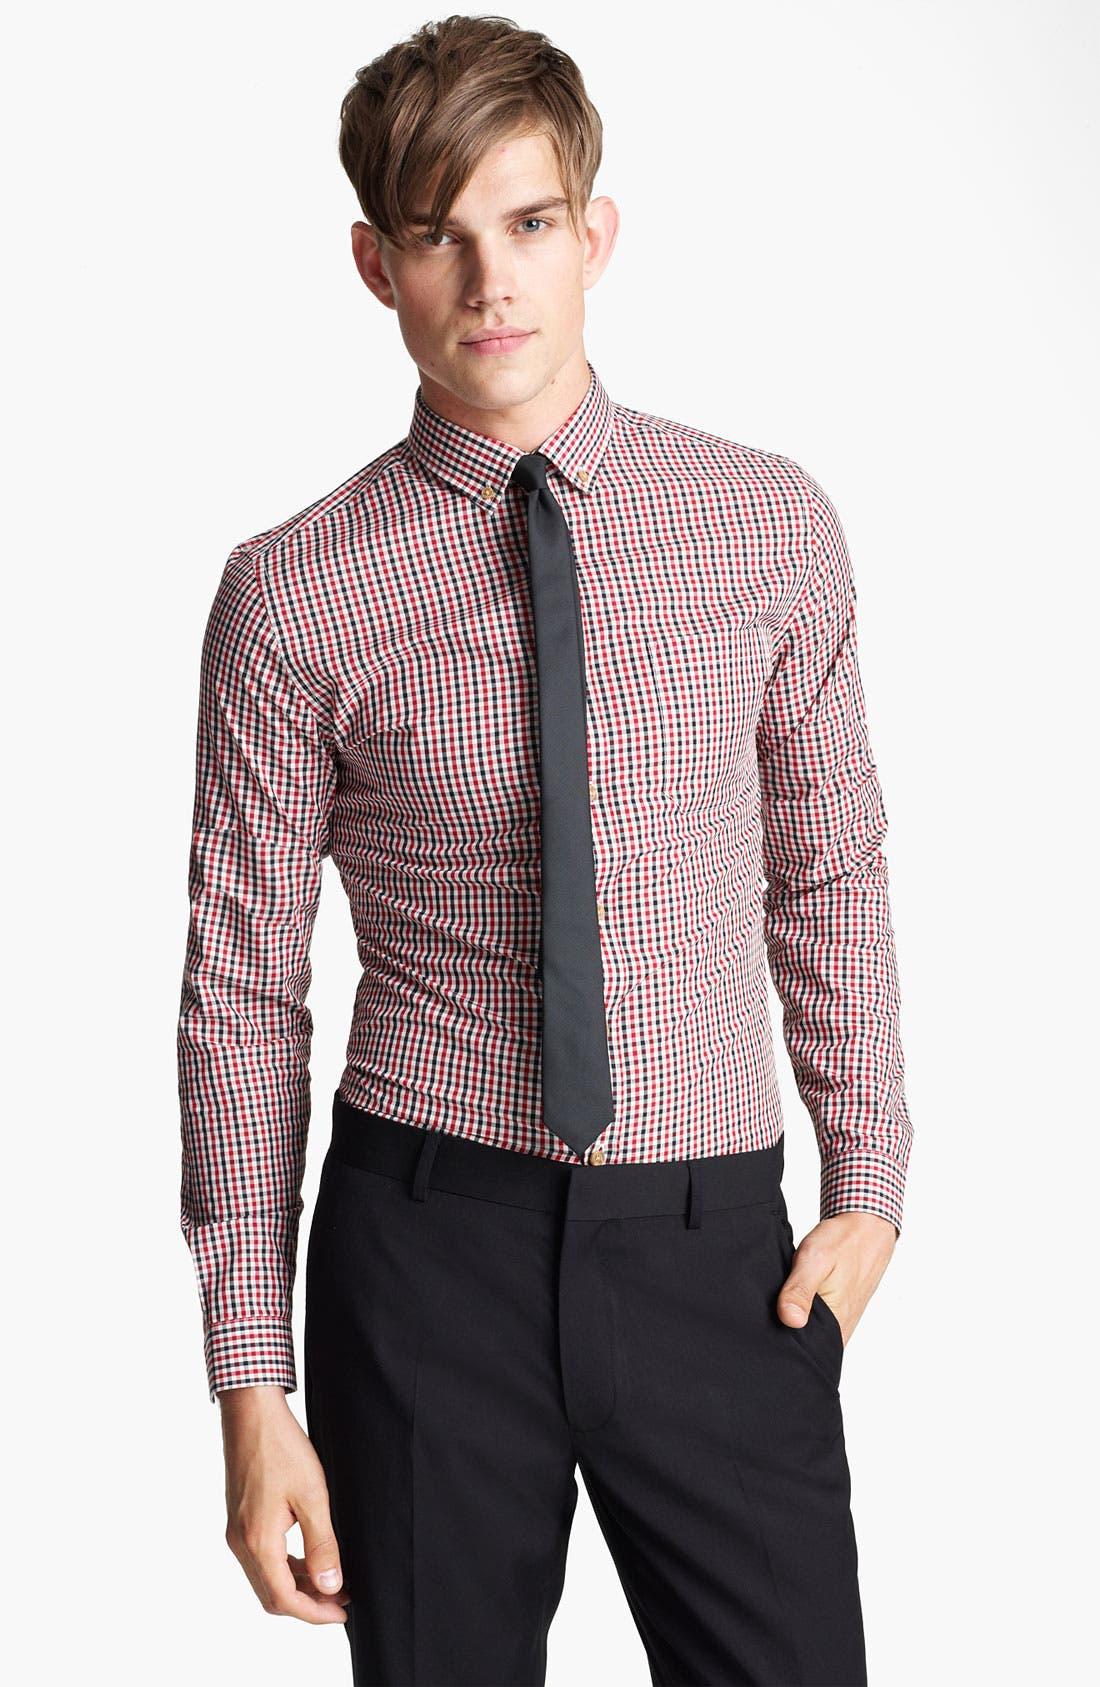 Alternate Image 1 Selected - Topman 'Smart' Check Dress Shirt